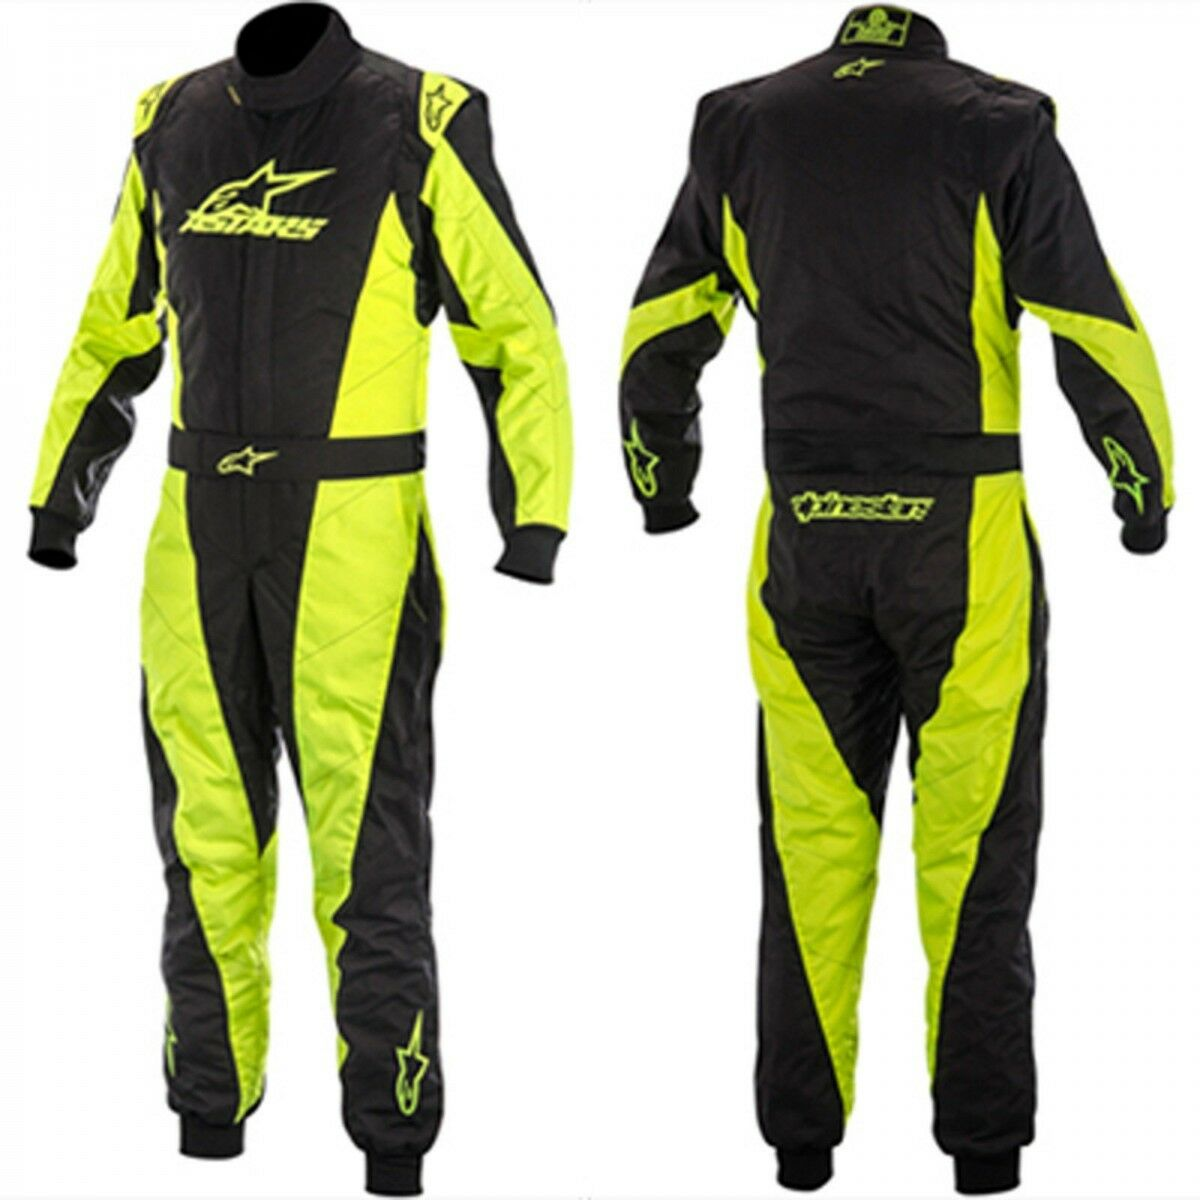 Alpinestars Go Kart  Racing Suit K-MX5 NRG Ltd Edition Blk Yel  cheap